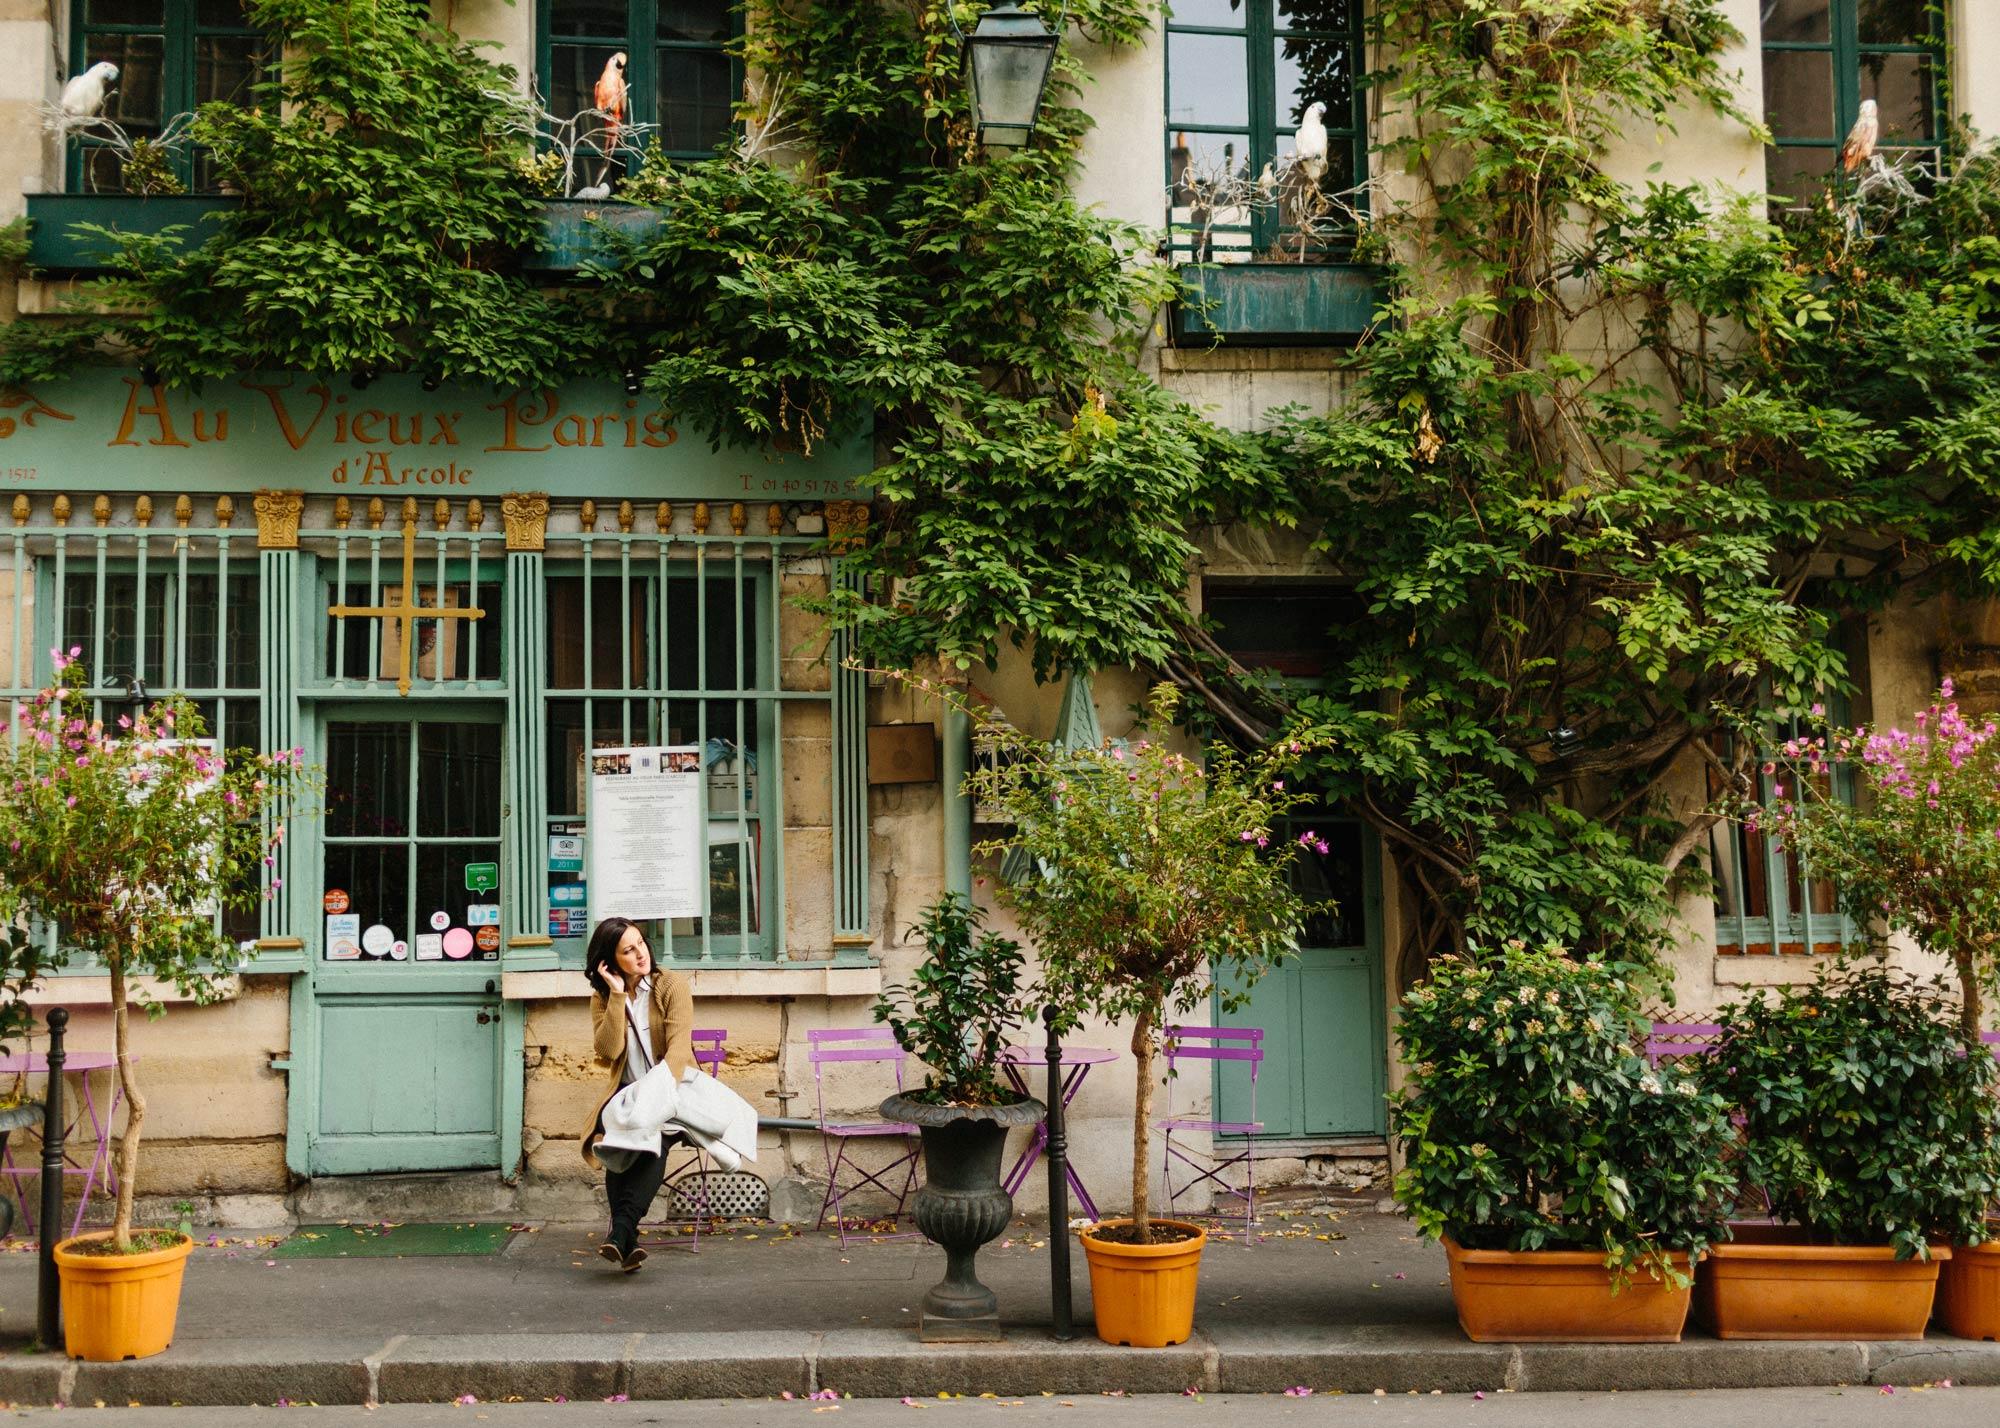 Paris Cafe Travel Photography